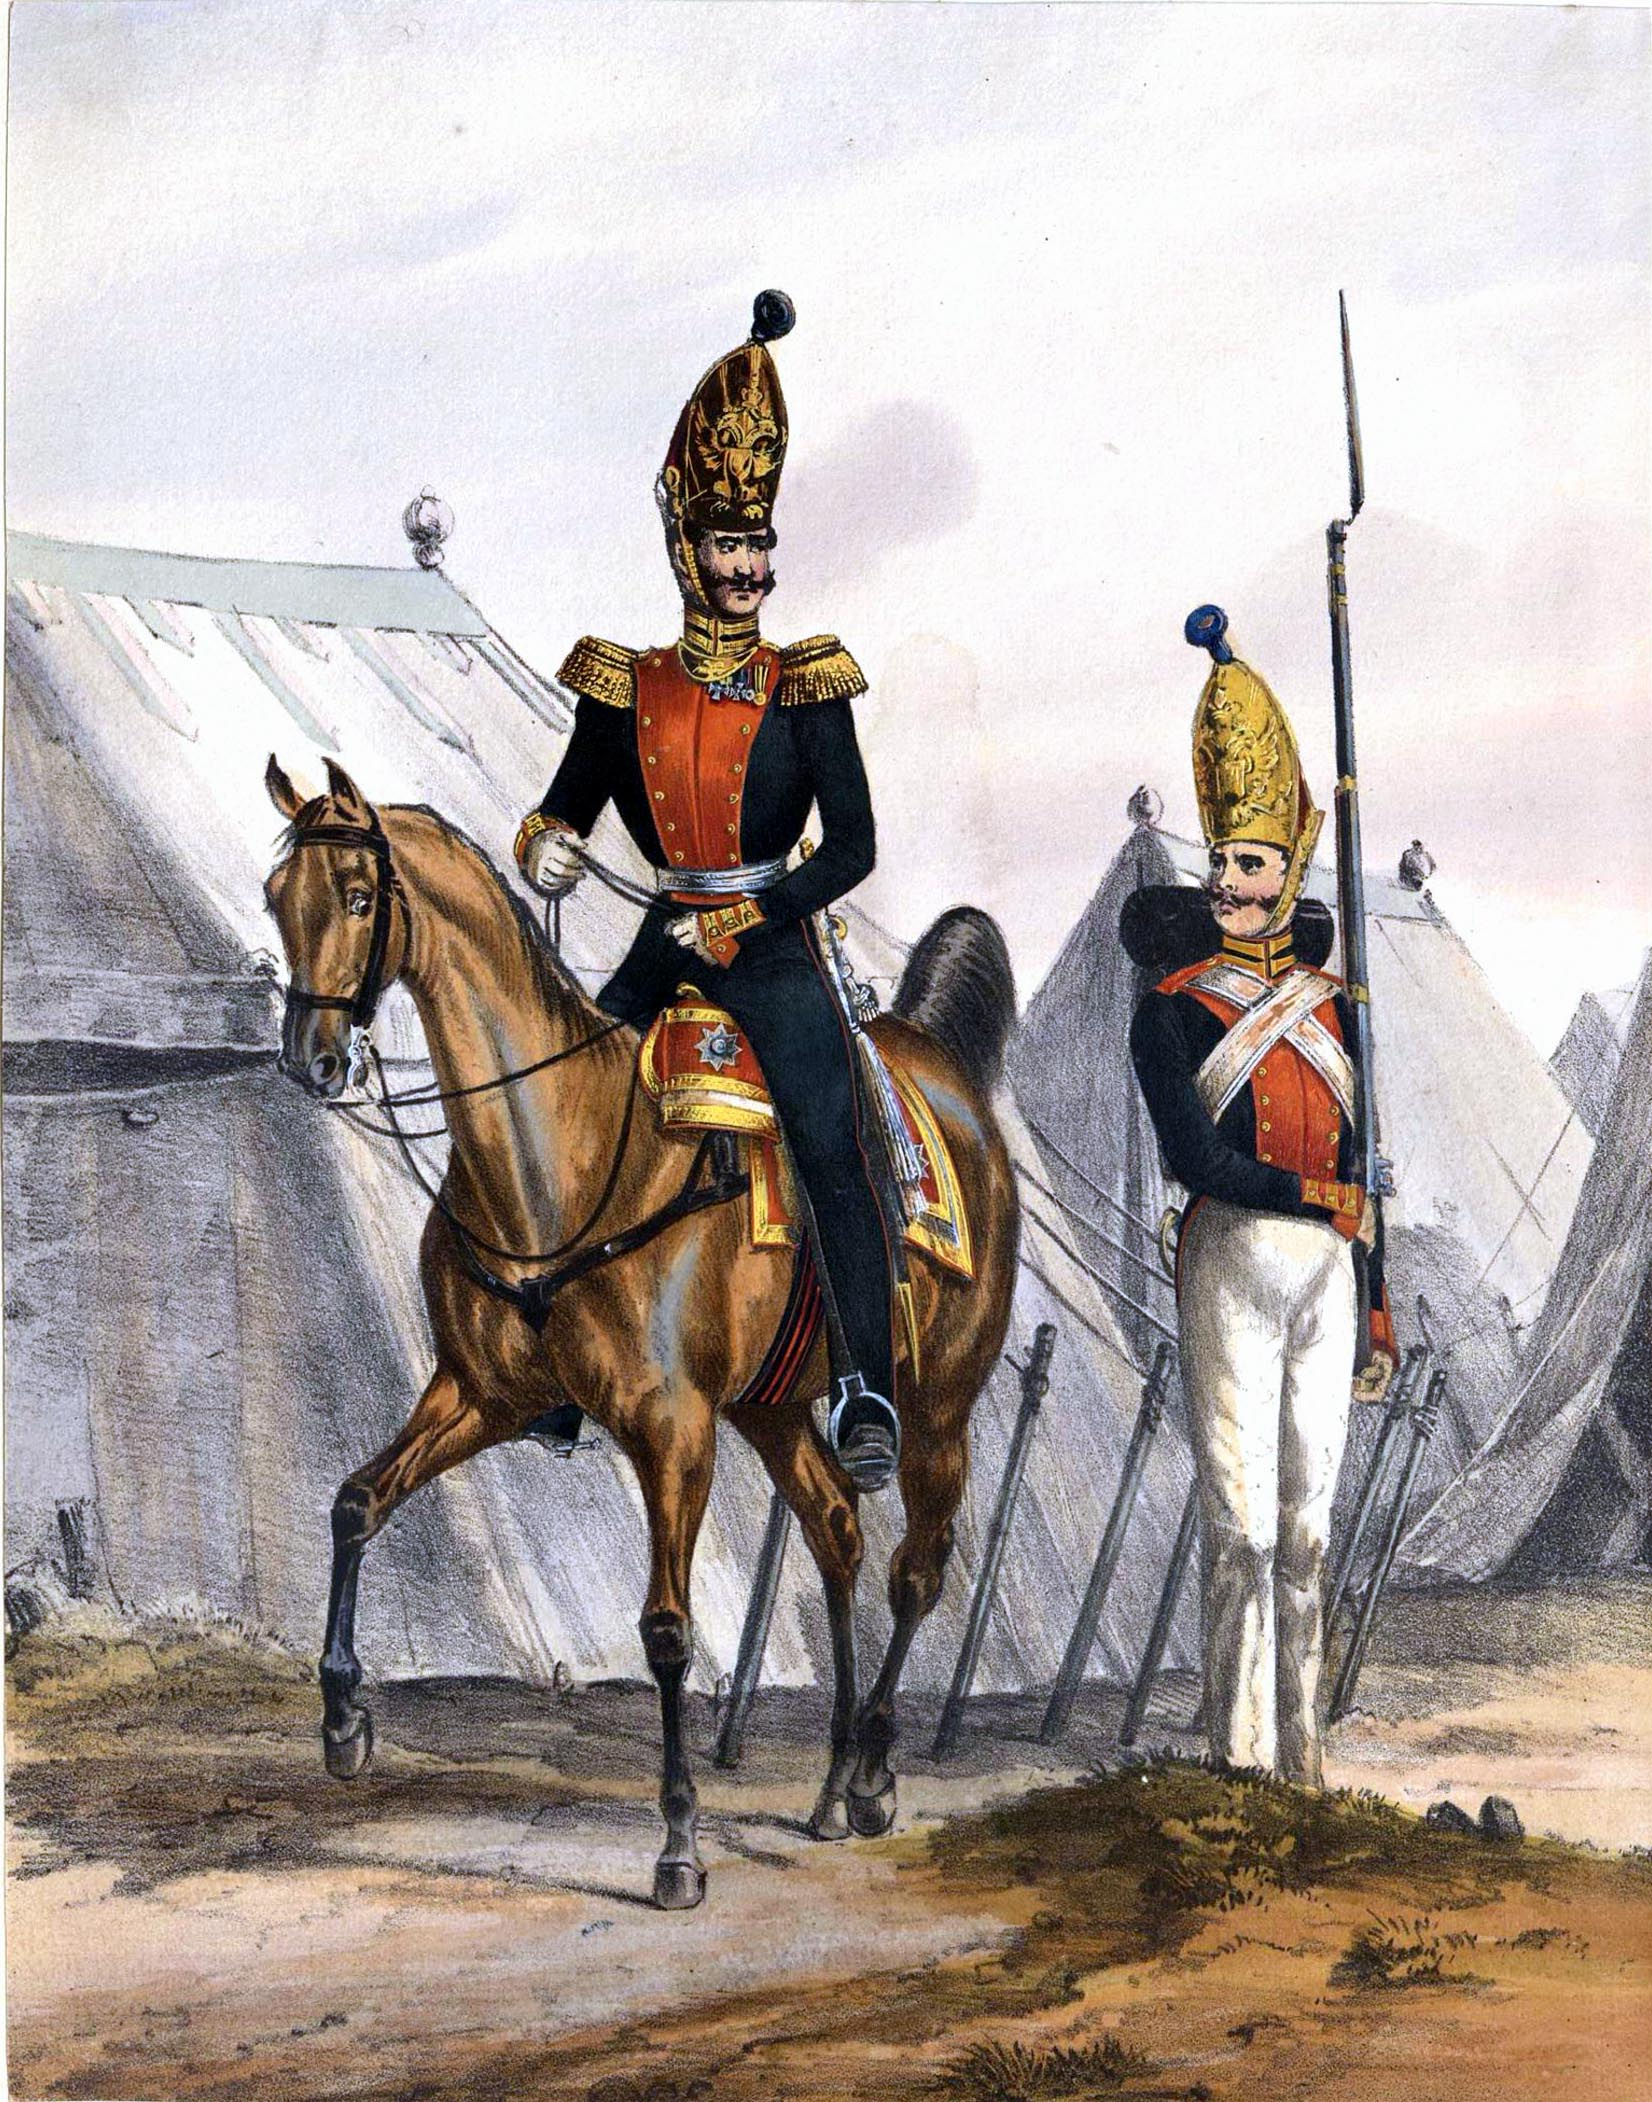 014. Kaiserthum Russland Garde-Regiment Kaiser Paul: Stabsoffizier u. Gemeiner in Parade / Российская империя